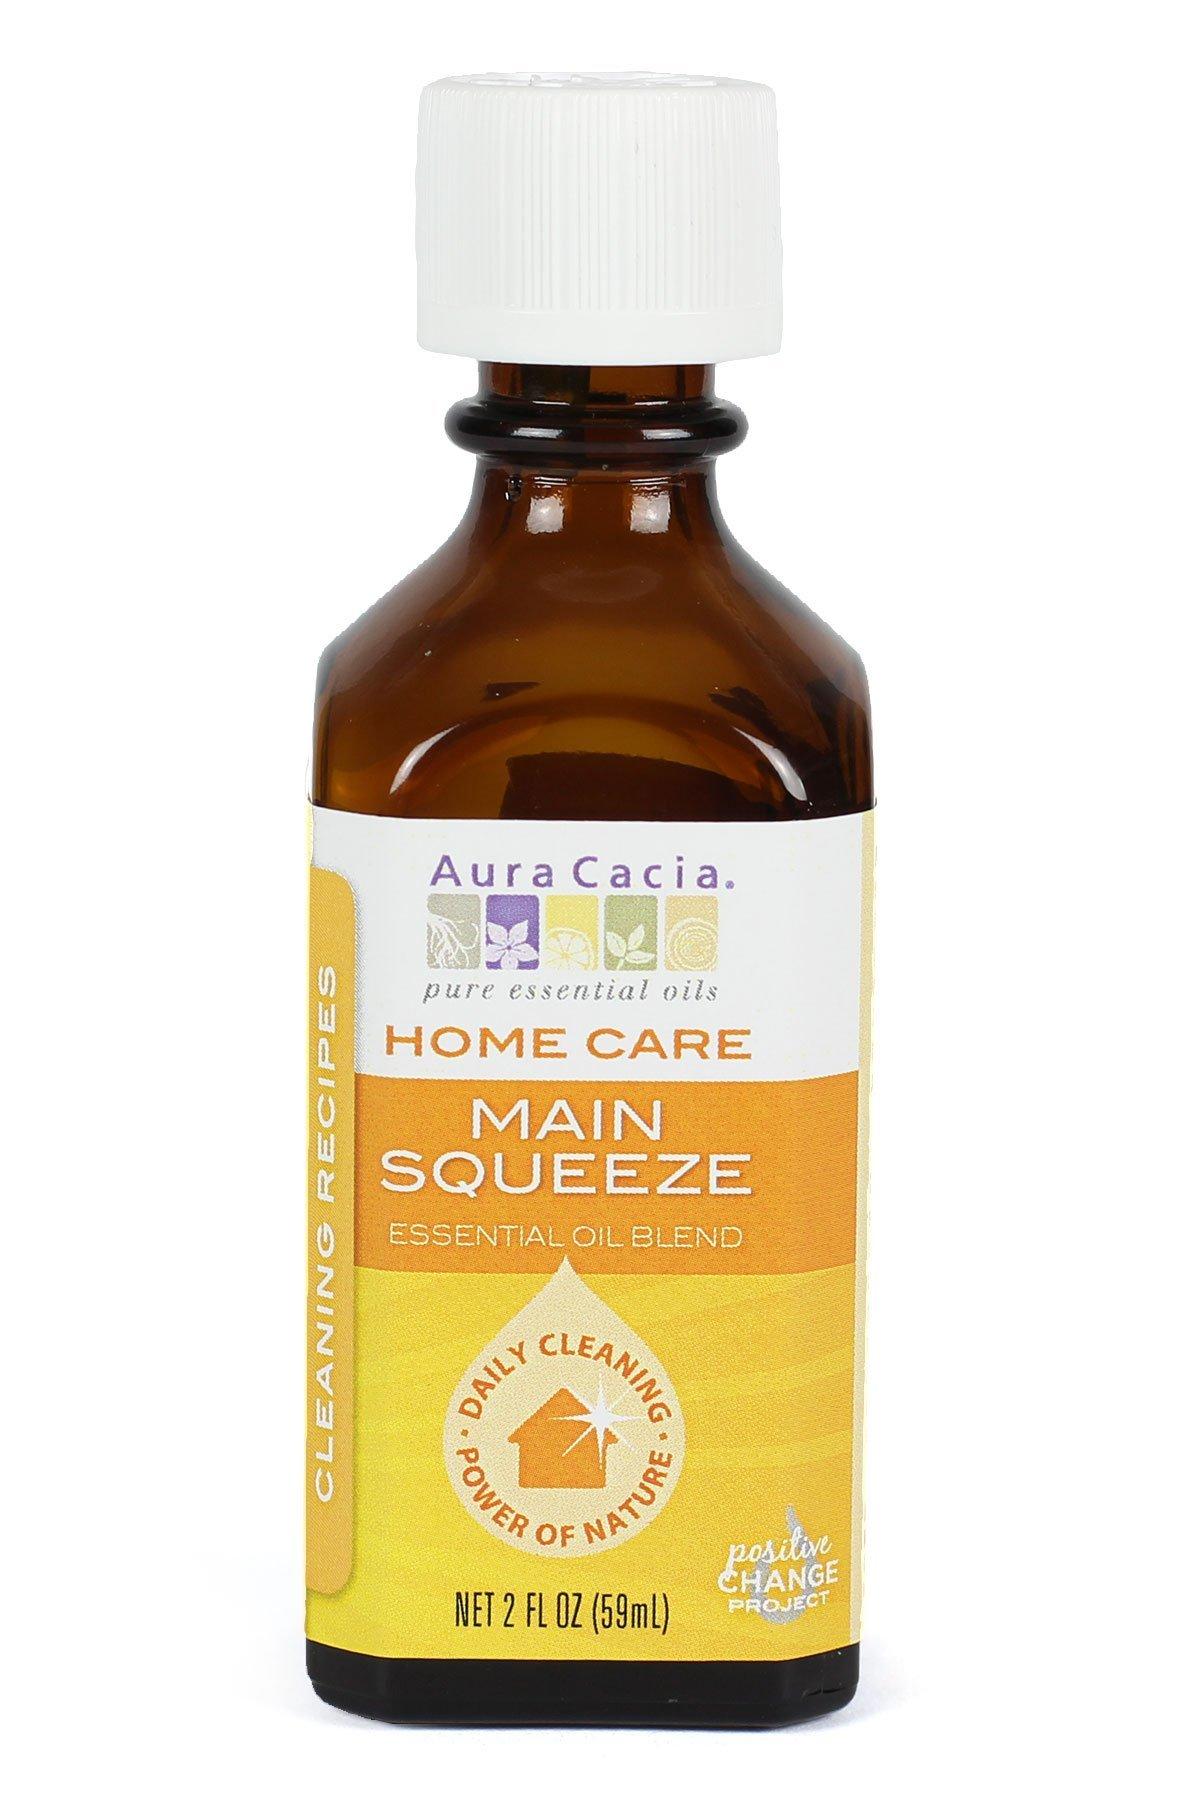 Aura Cacia Main Squeeze Essential Oil Blend for Home Care, 2 Fluid Ounce